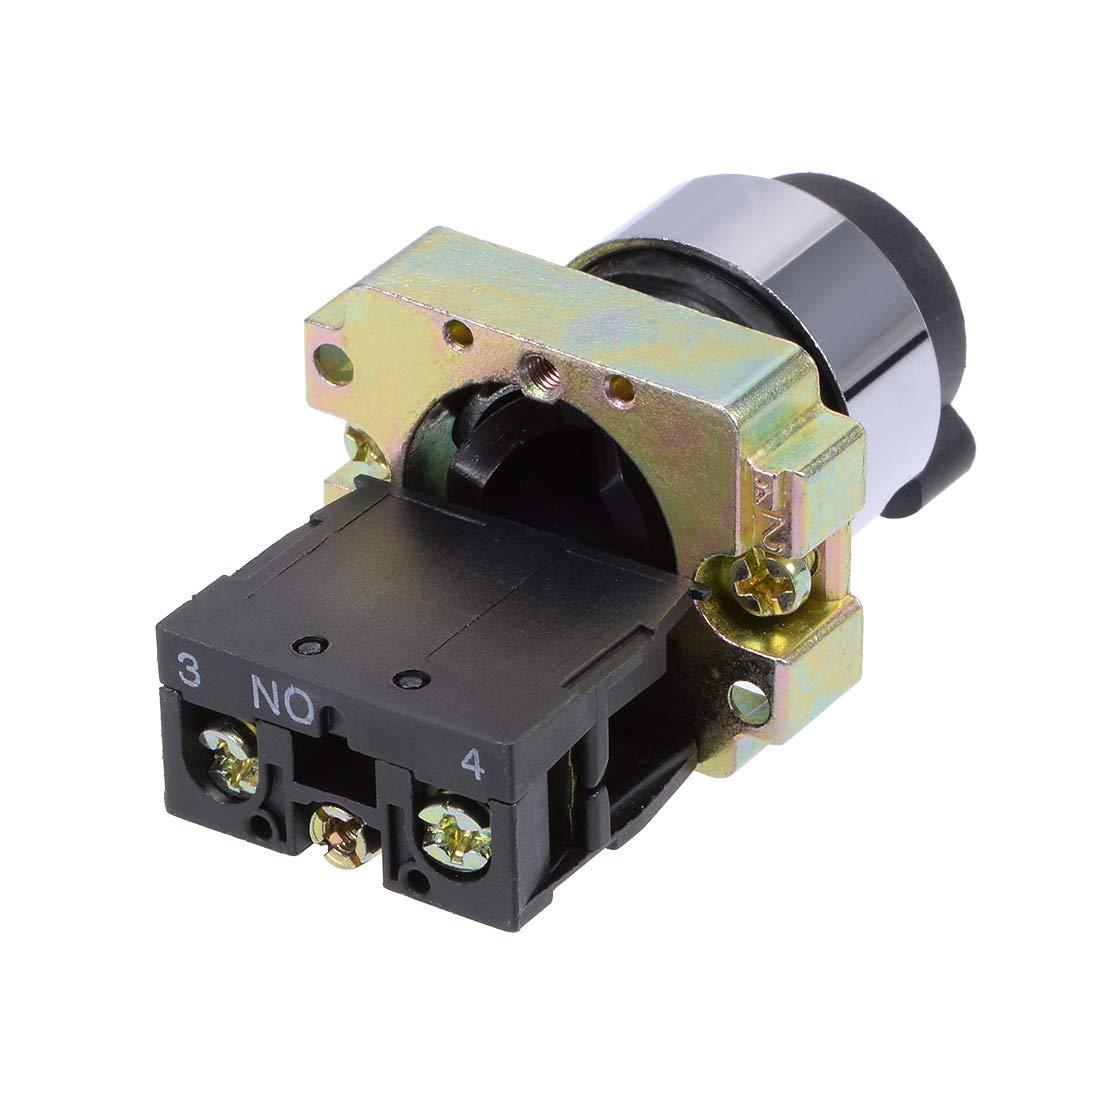 uxcell/® 22mm 2 Position Key Locking Push Button Switch W Keys Black NO